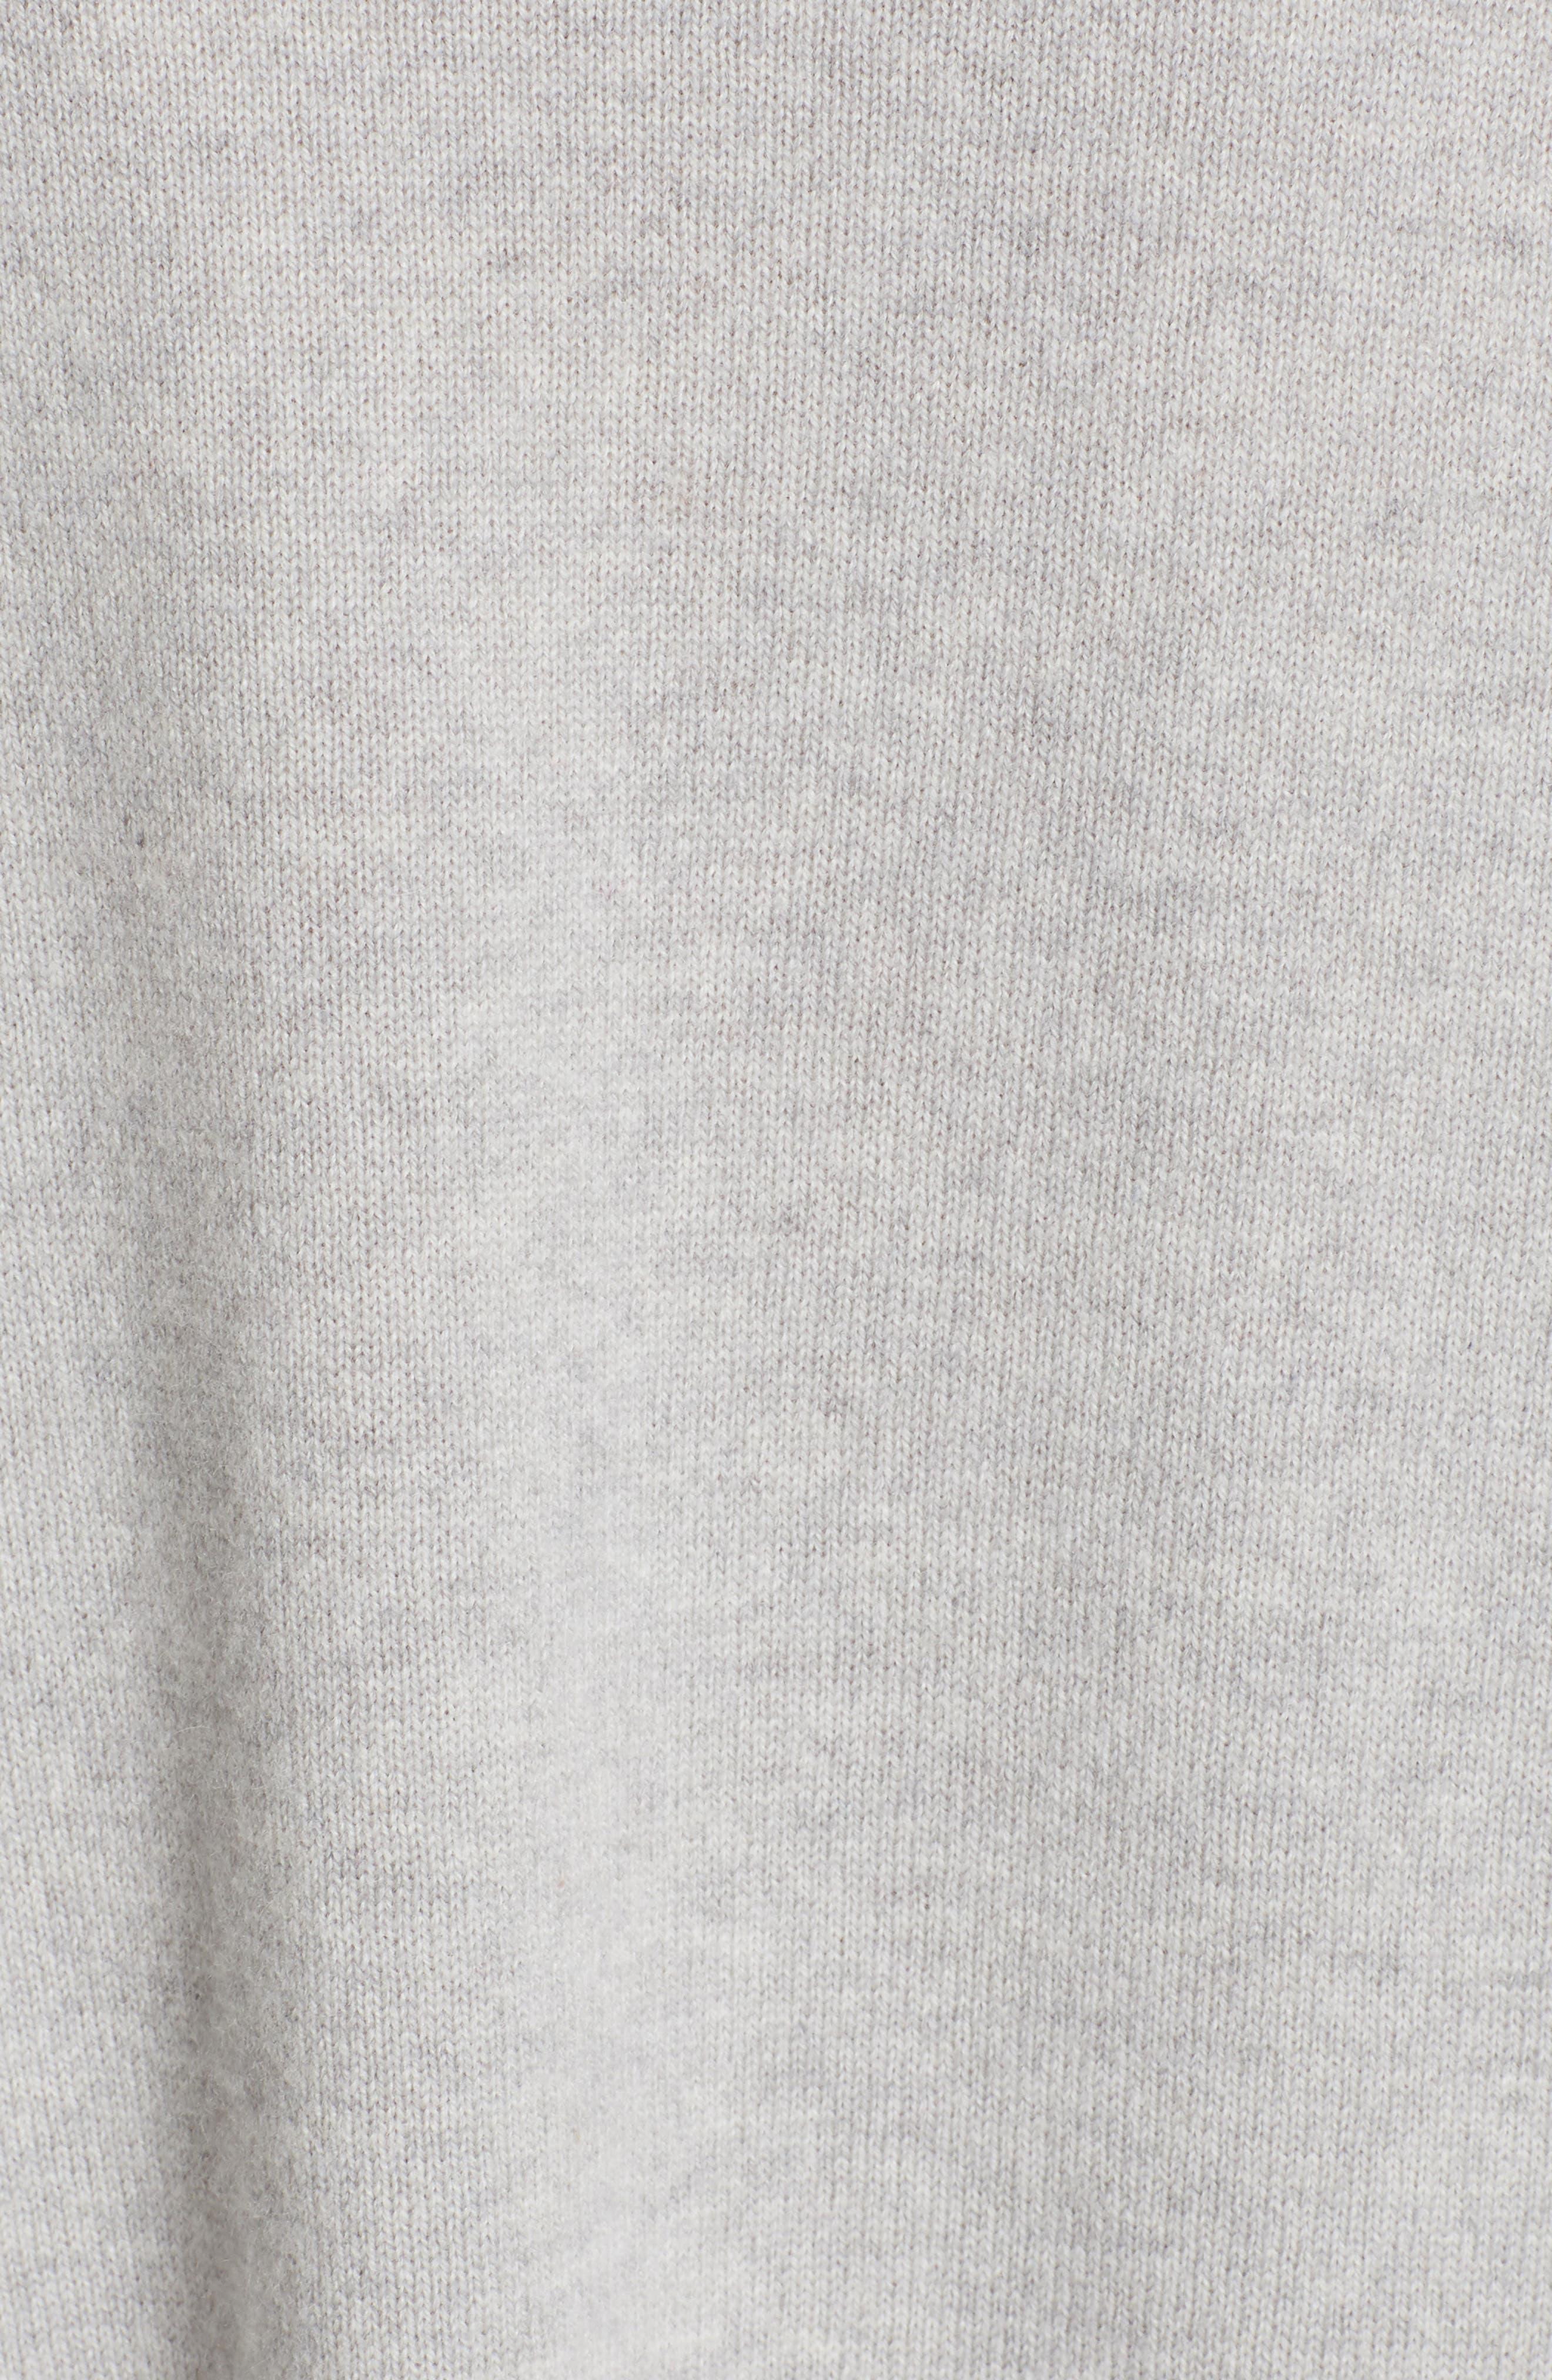 FABIANA FILIPPI,                             Tulle Inset Cashmere Sweater,                             Alternate thumbnail 6, color,                             GREY